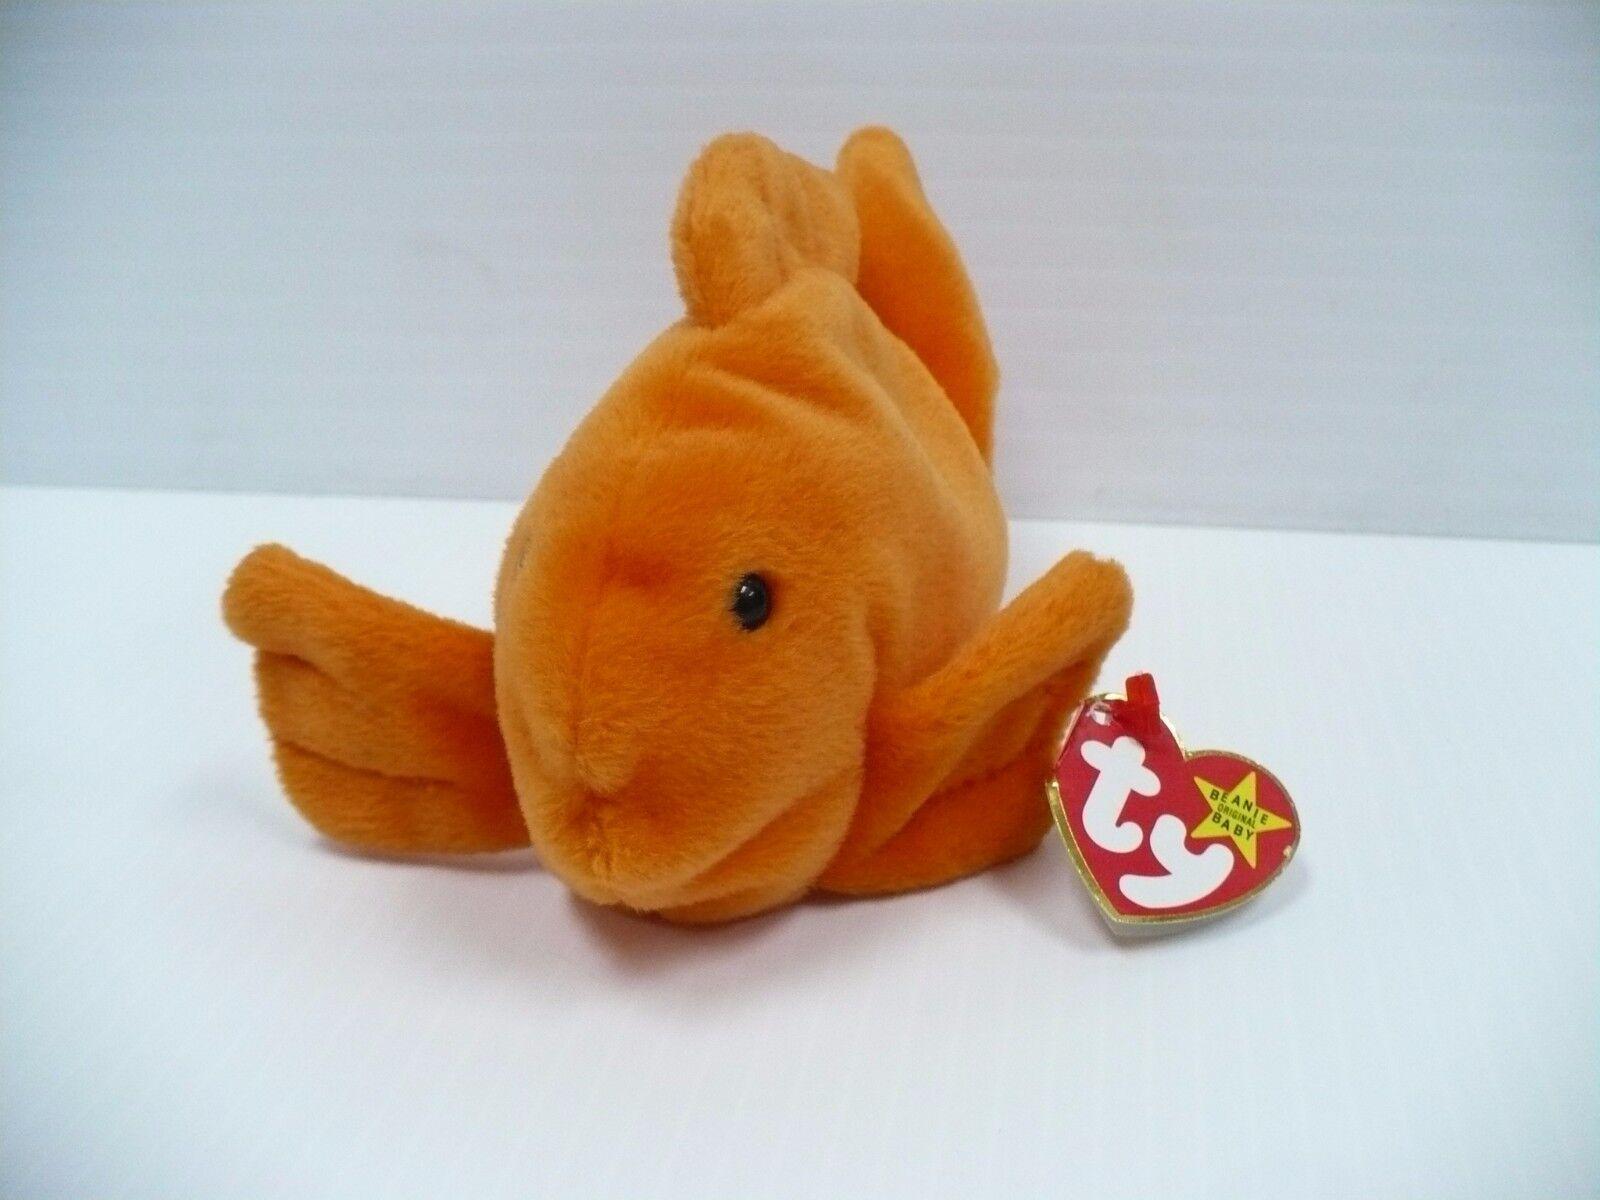 RETIRED rare 1993 goldie The goldfish Beanie Baby WITH ERRORS